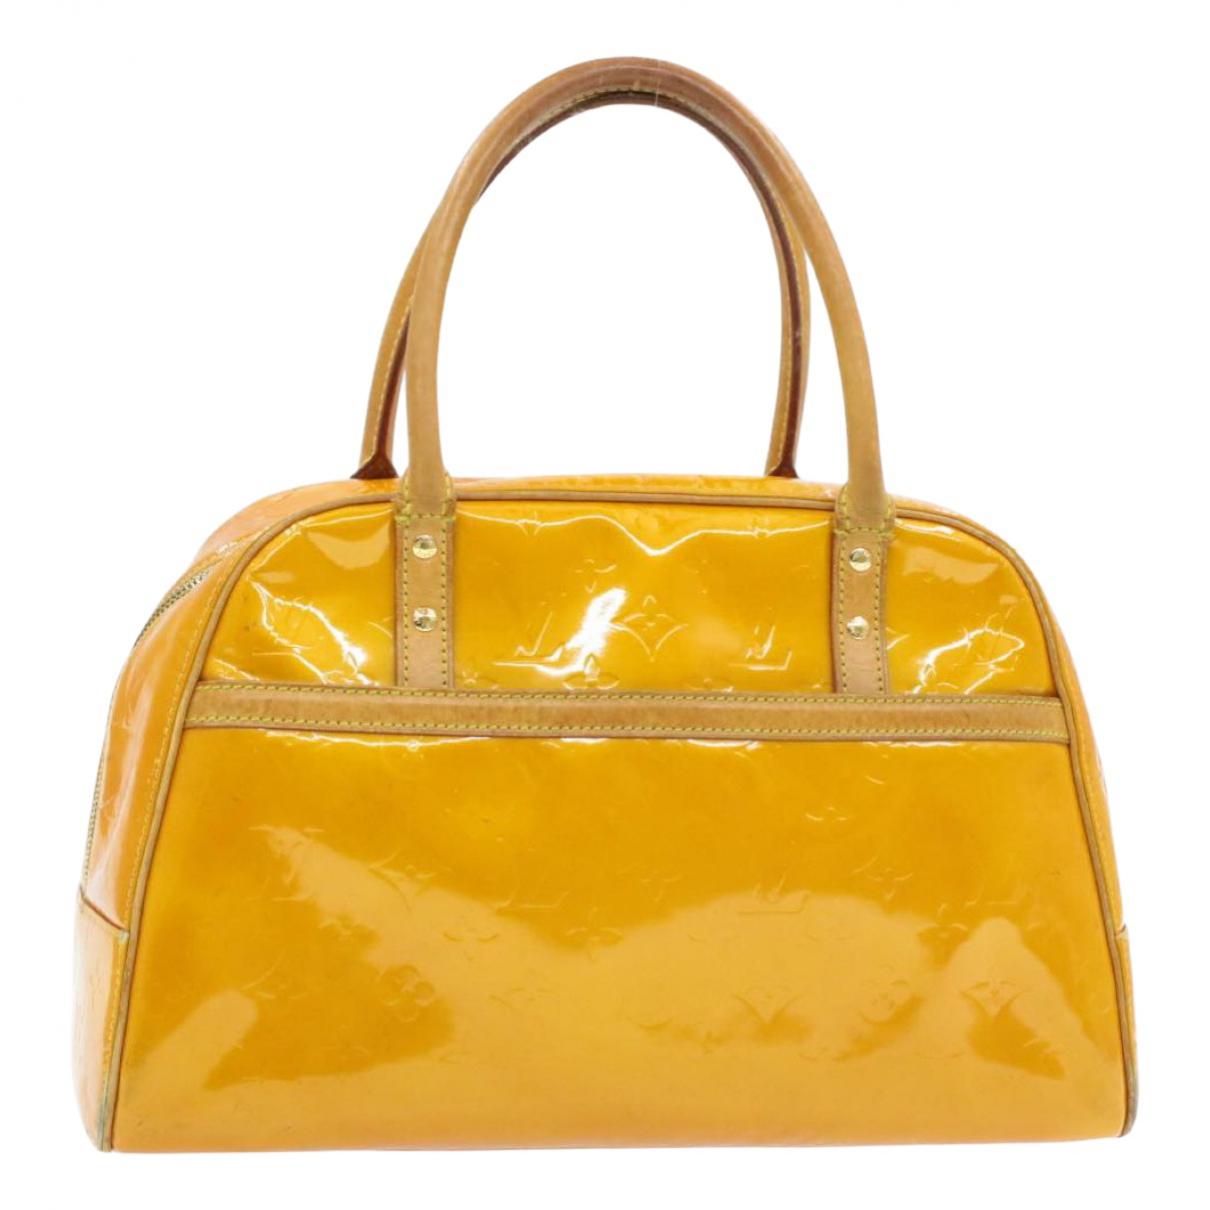 Louis Vuitton Tompkins Square  Yellow Patent leather handbag for Women \N